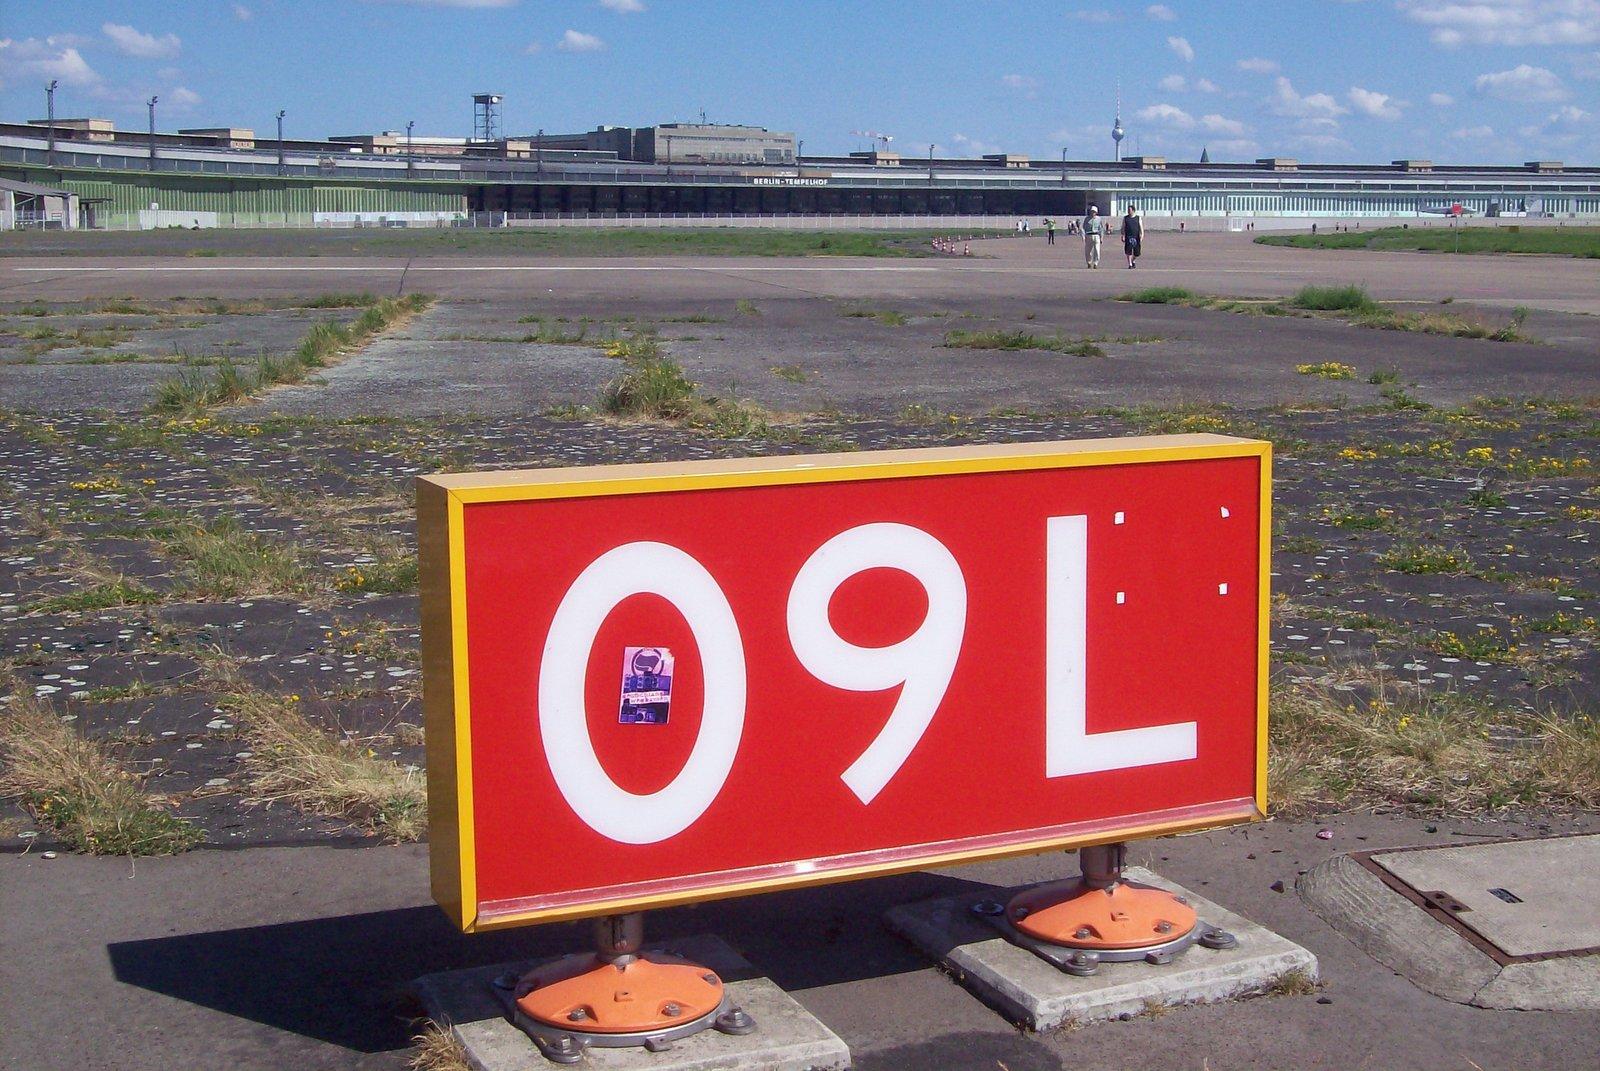 Flughafen Tempelhof - Bahn 09 L